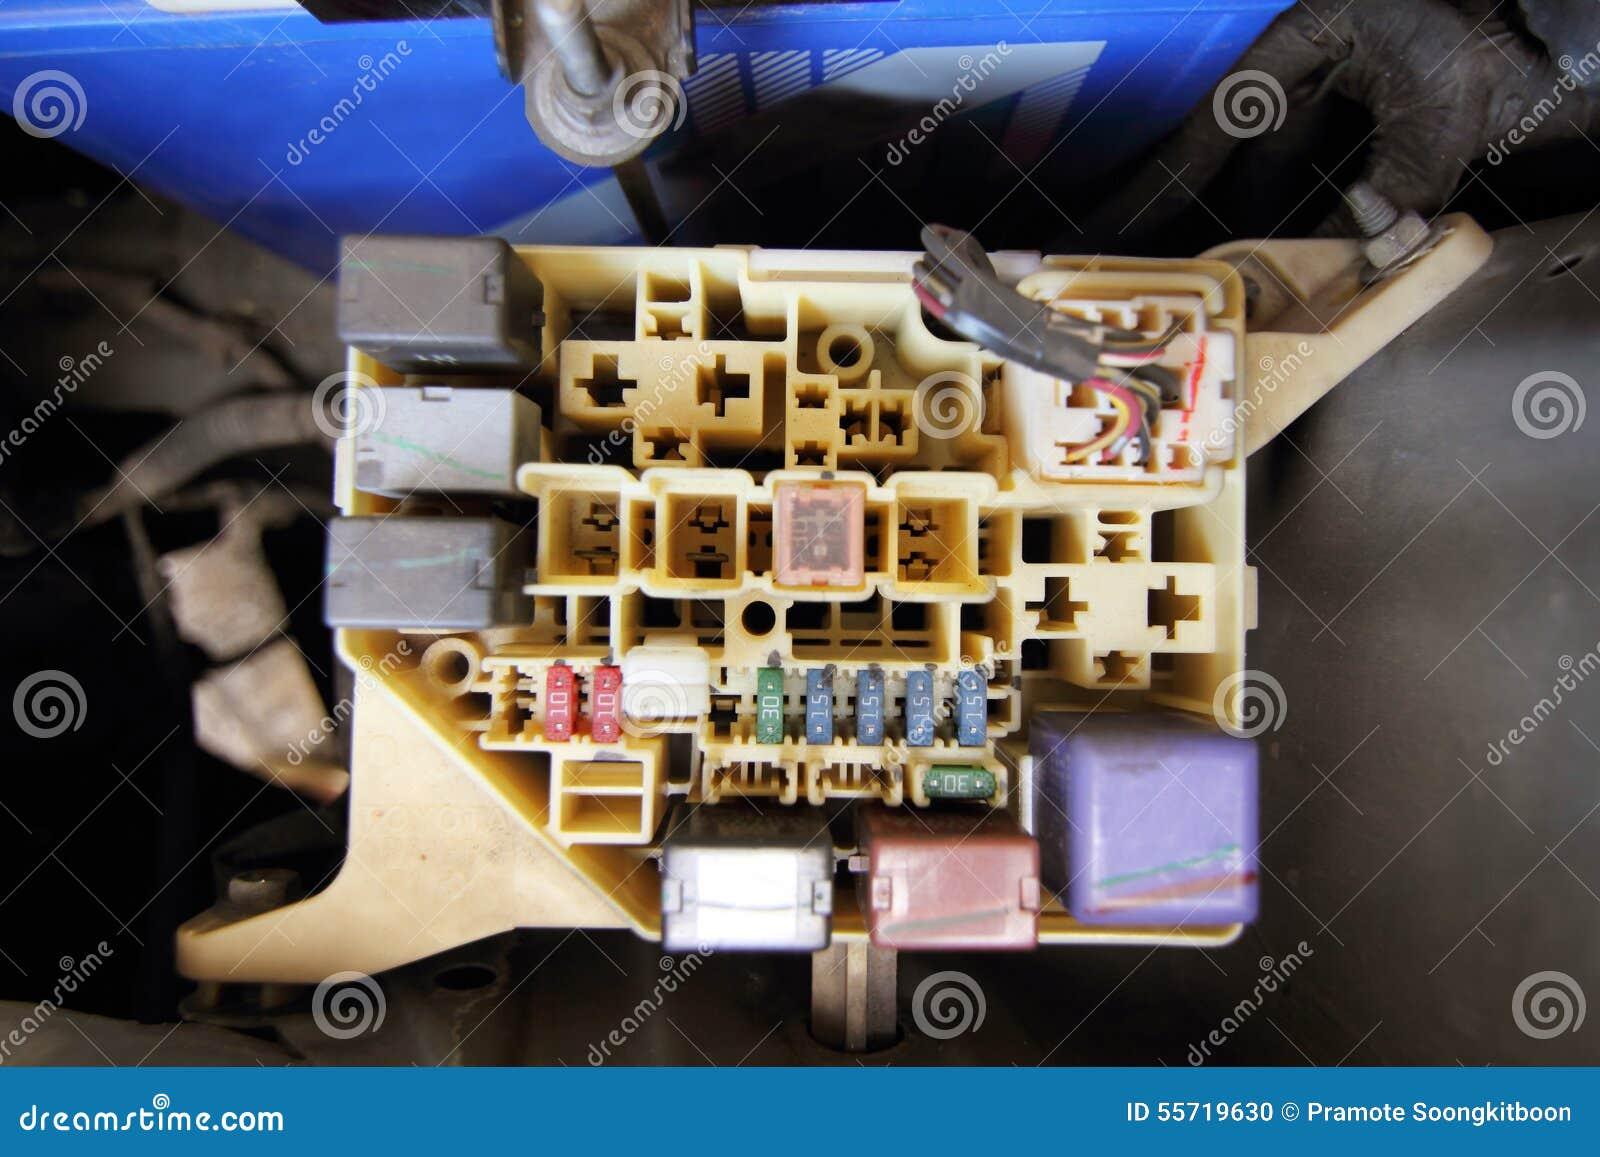 Fuse Box Of Car Stock Photo Image Closeup Focus 55719630 On Download